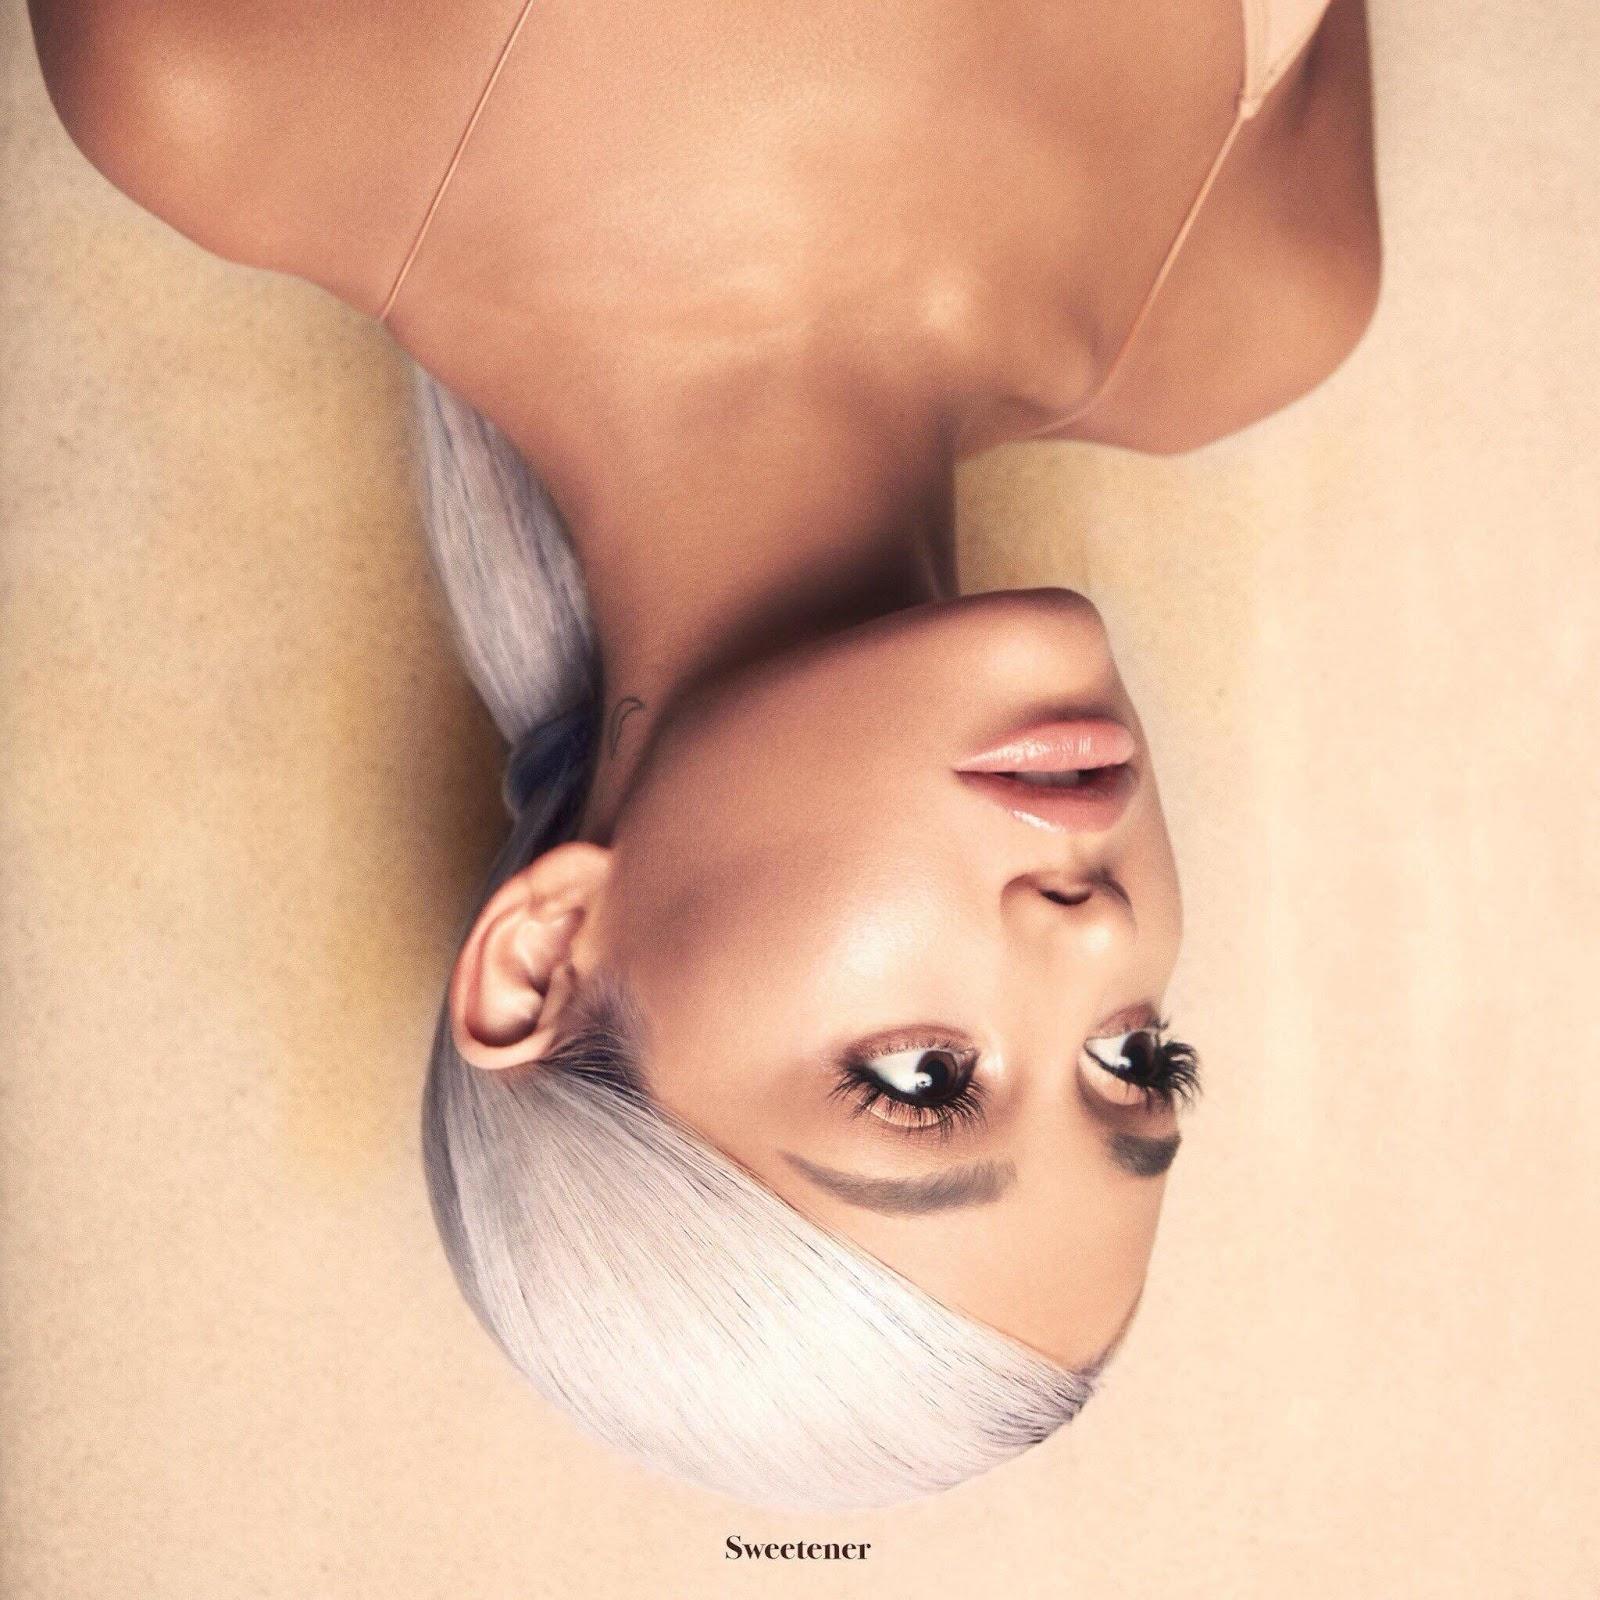 August 17: 'Sweetener' album by Ariana Grande